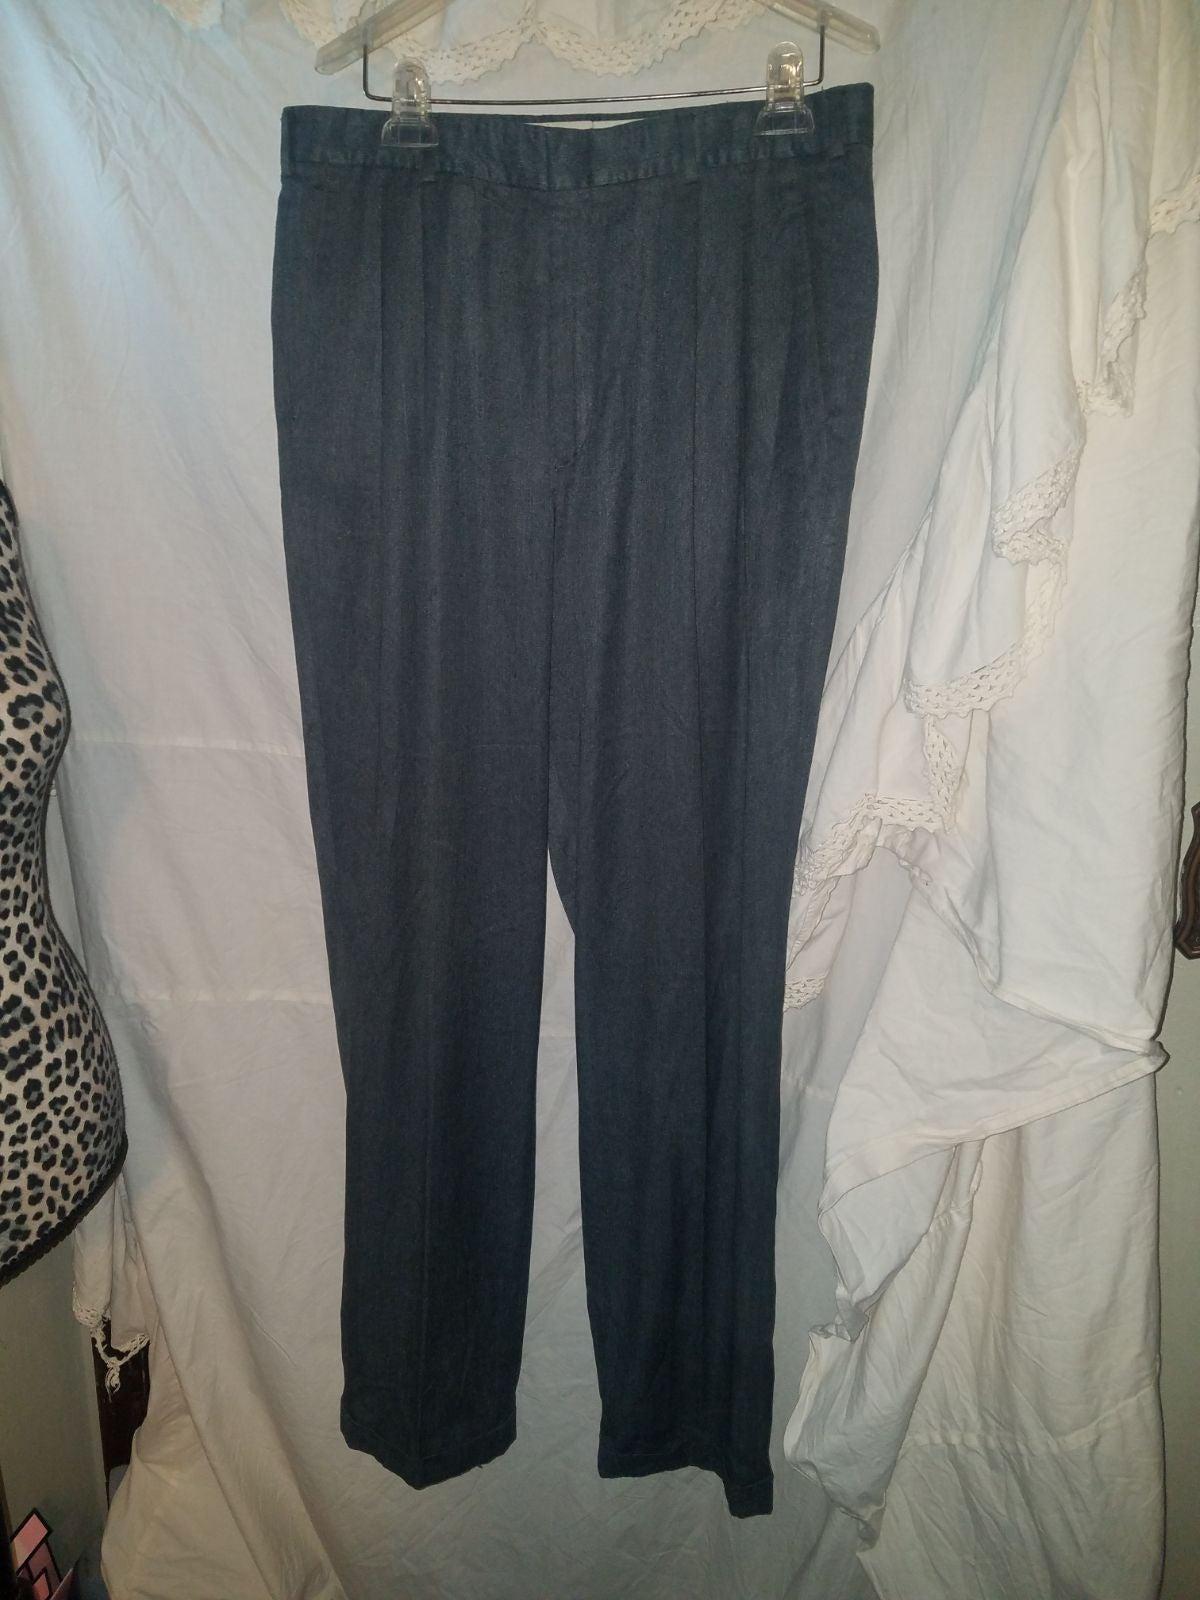 pants Mens dress pants grey 34x34